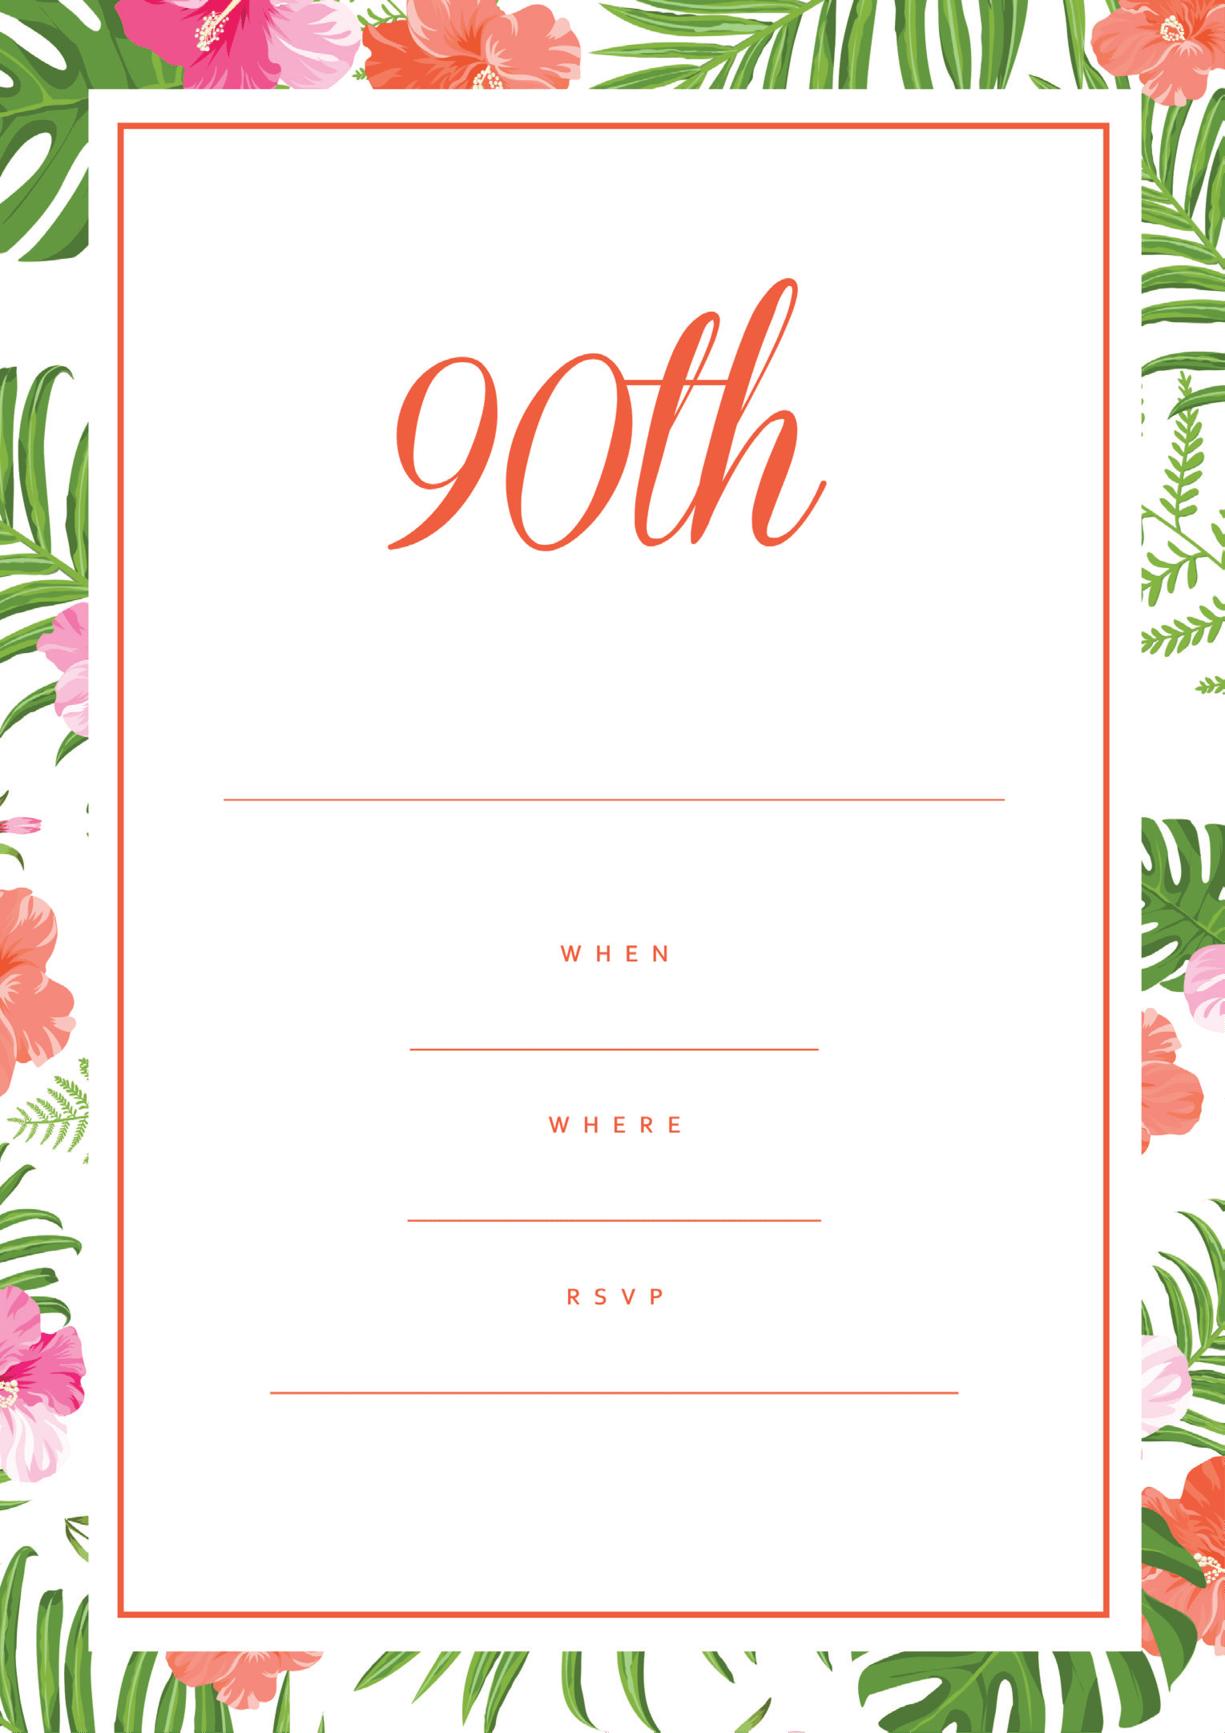 90th birthday party invitation hibiscus border